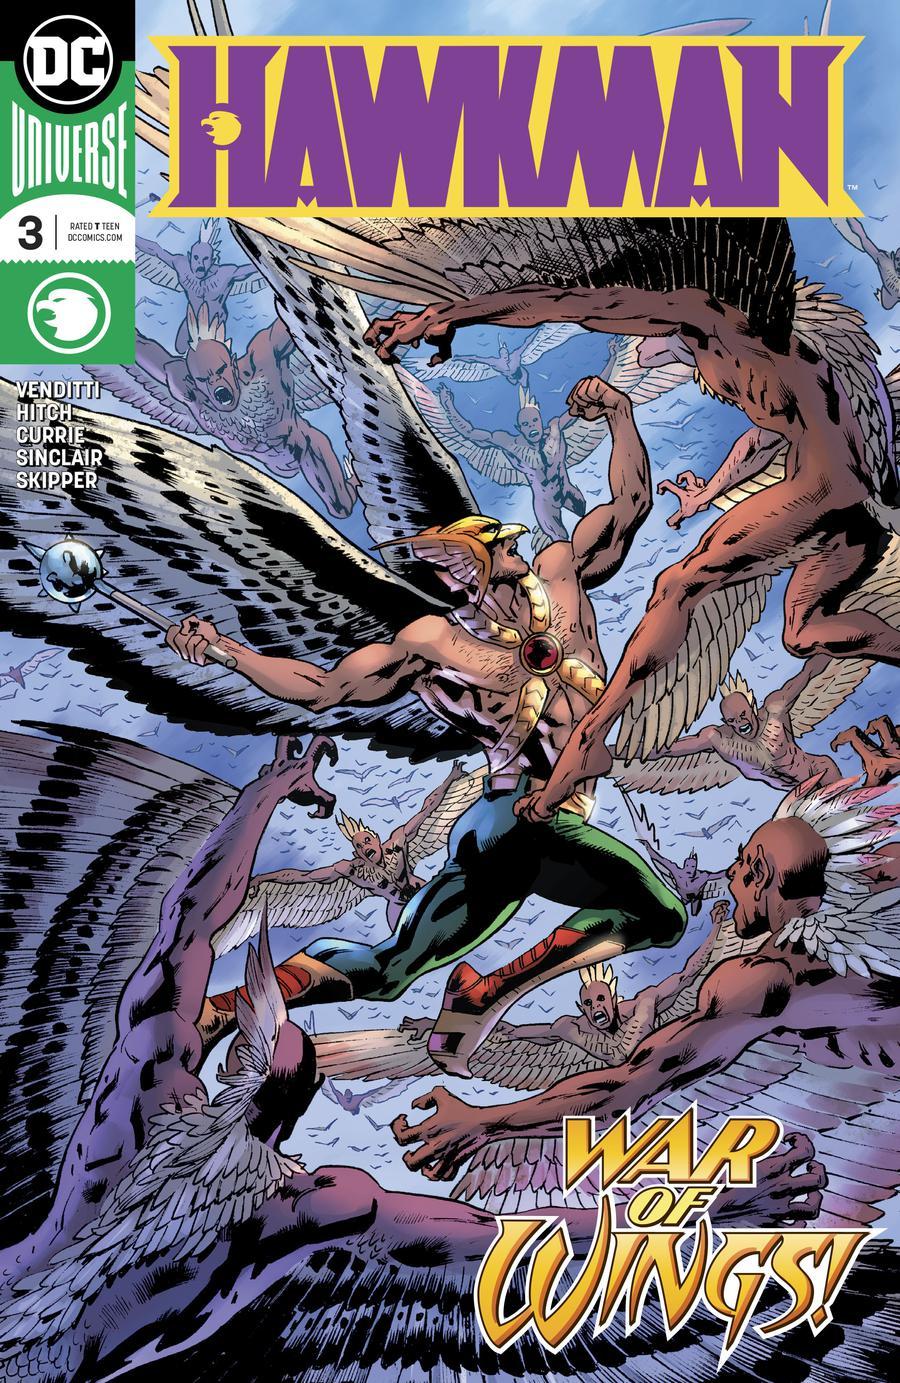 Hawkman Vol 5 #3 Cover A Regular Bryan Hitch Cover